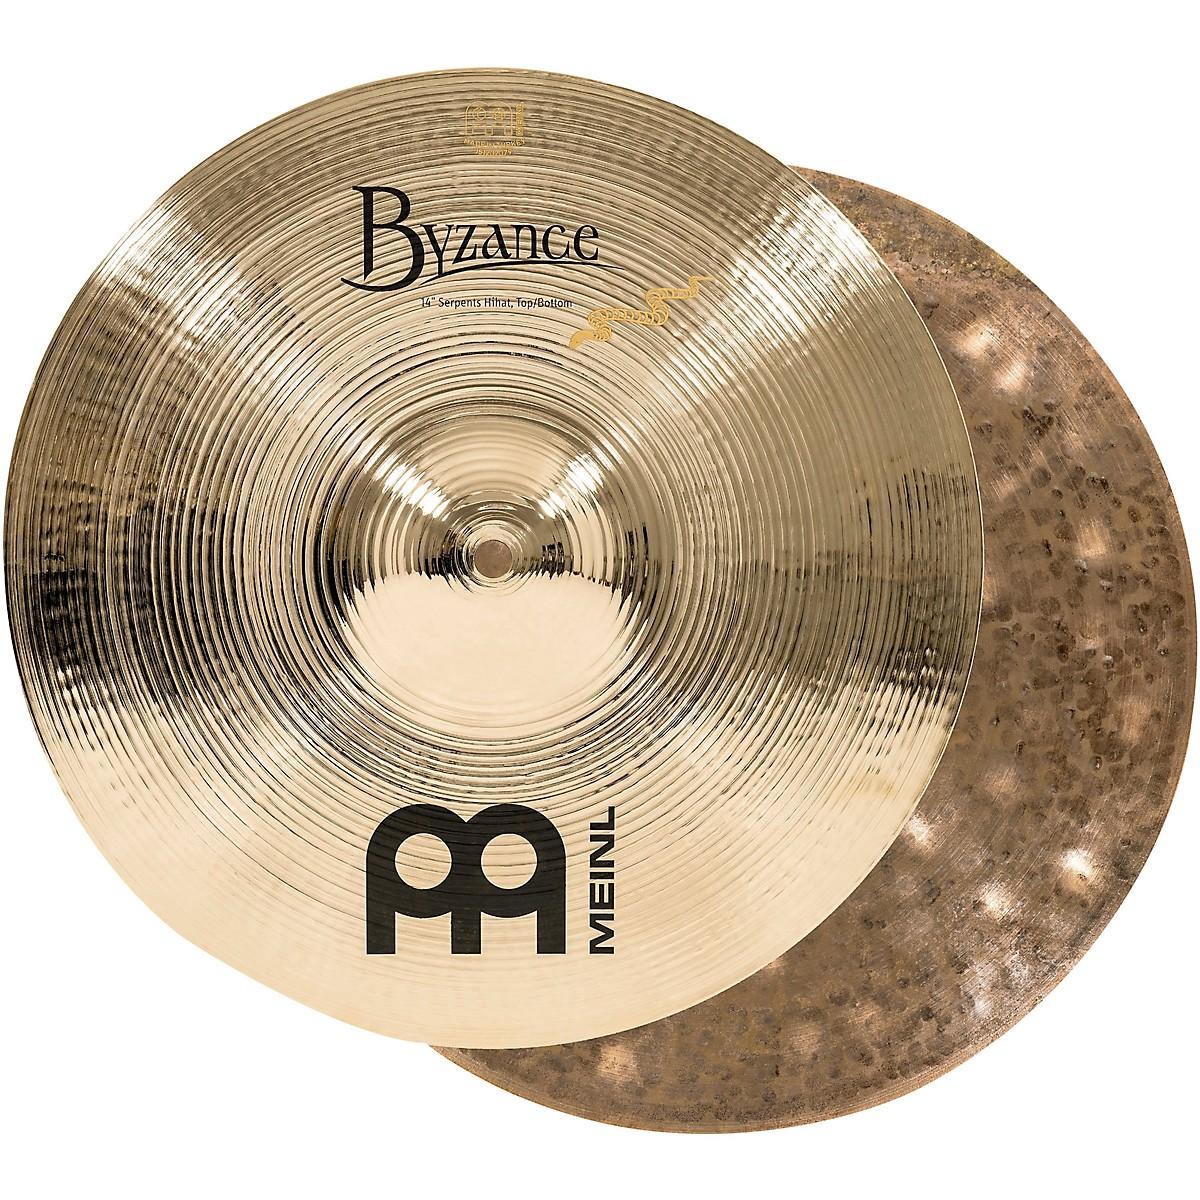 Meinl Byzance Brilliant Serpents Hi-Hat Cymbals